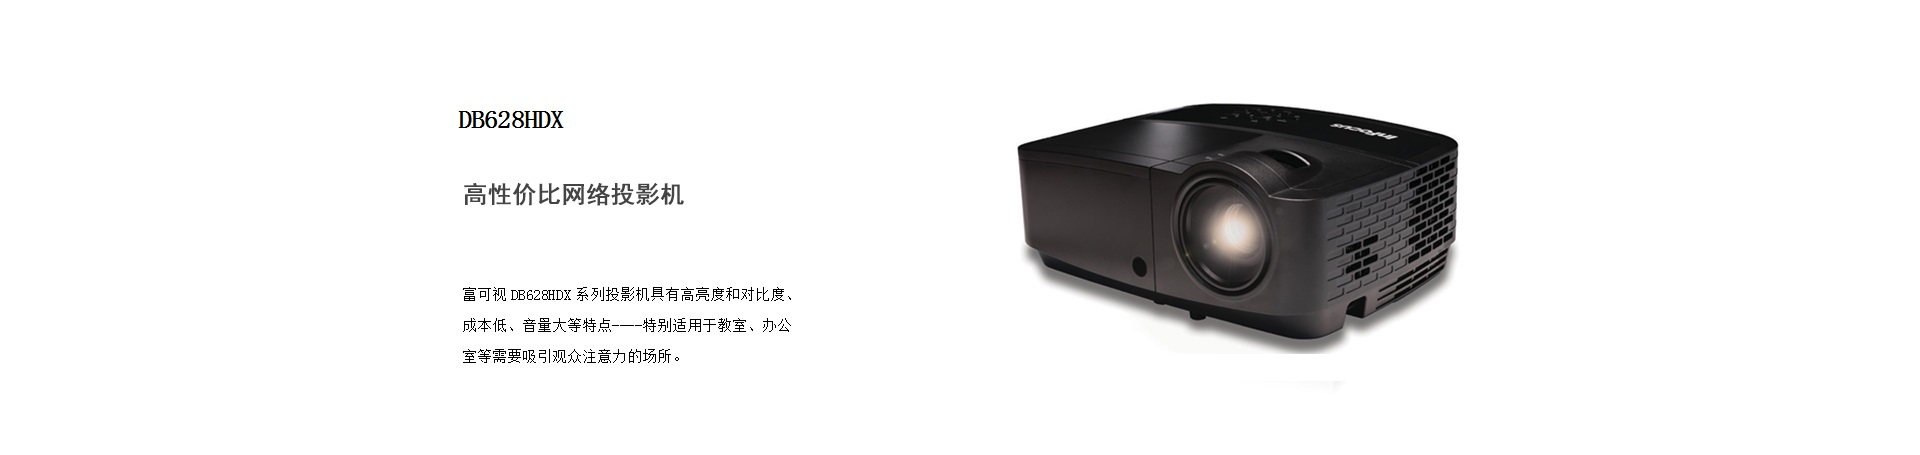 DB628HDx